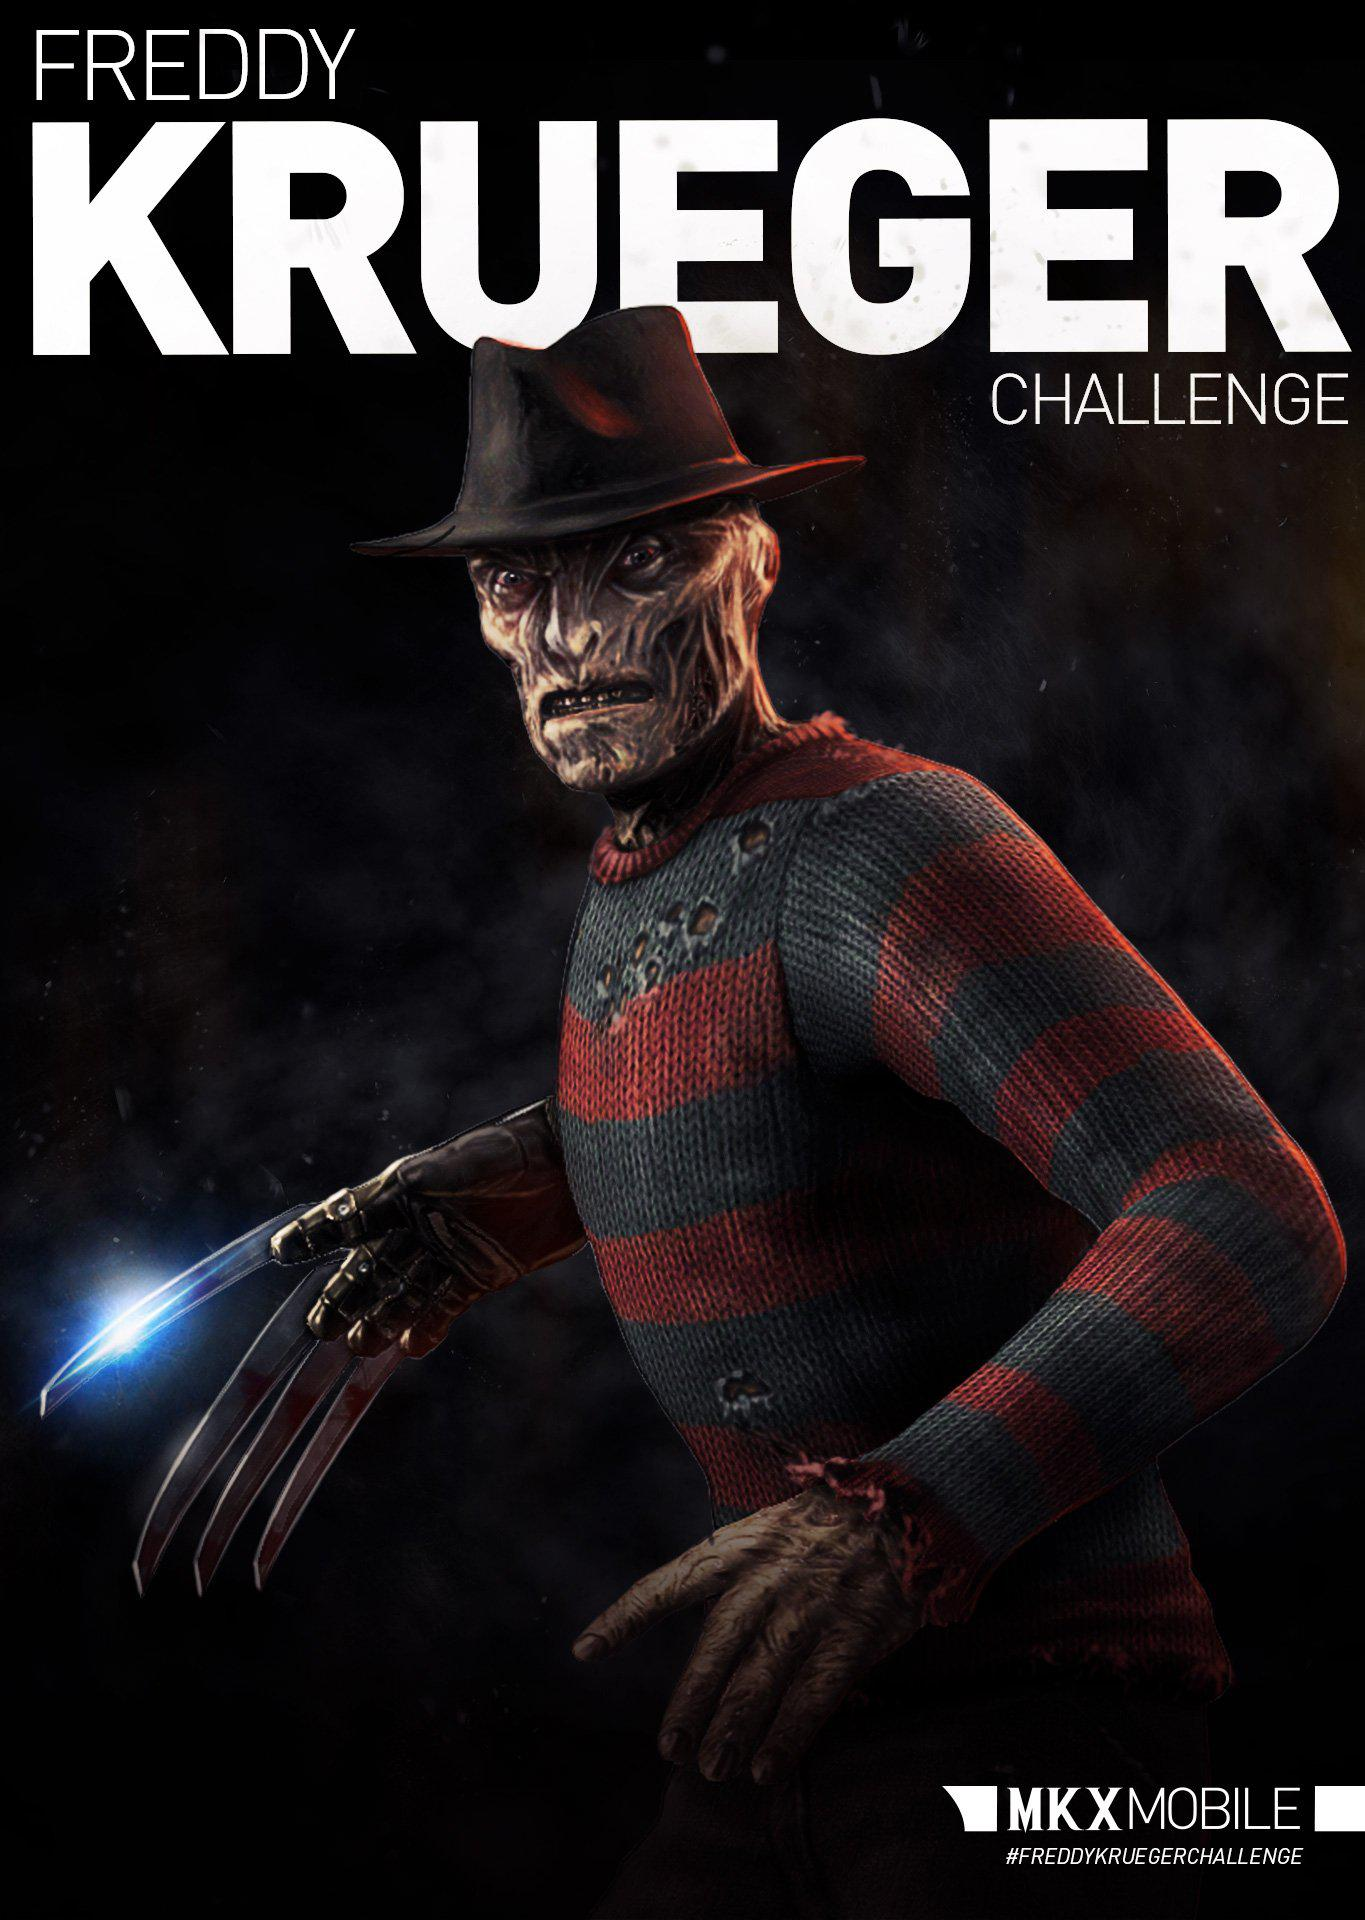 Mortal Kombat X Mobile - Freddy Krueger Challenge - Mortal